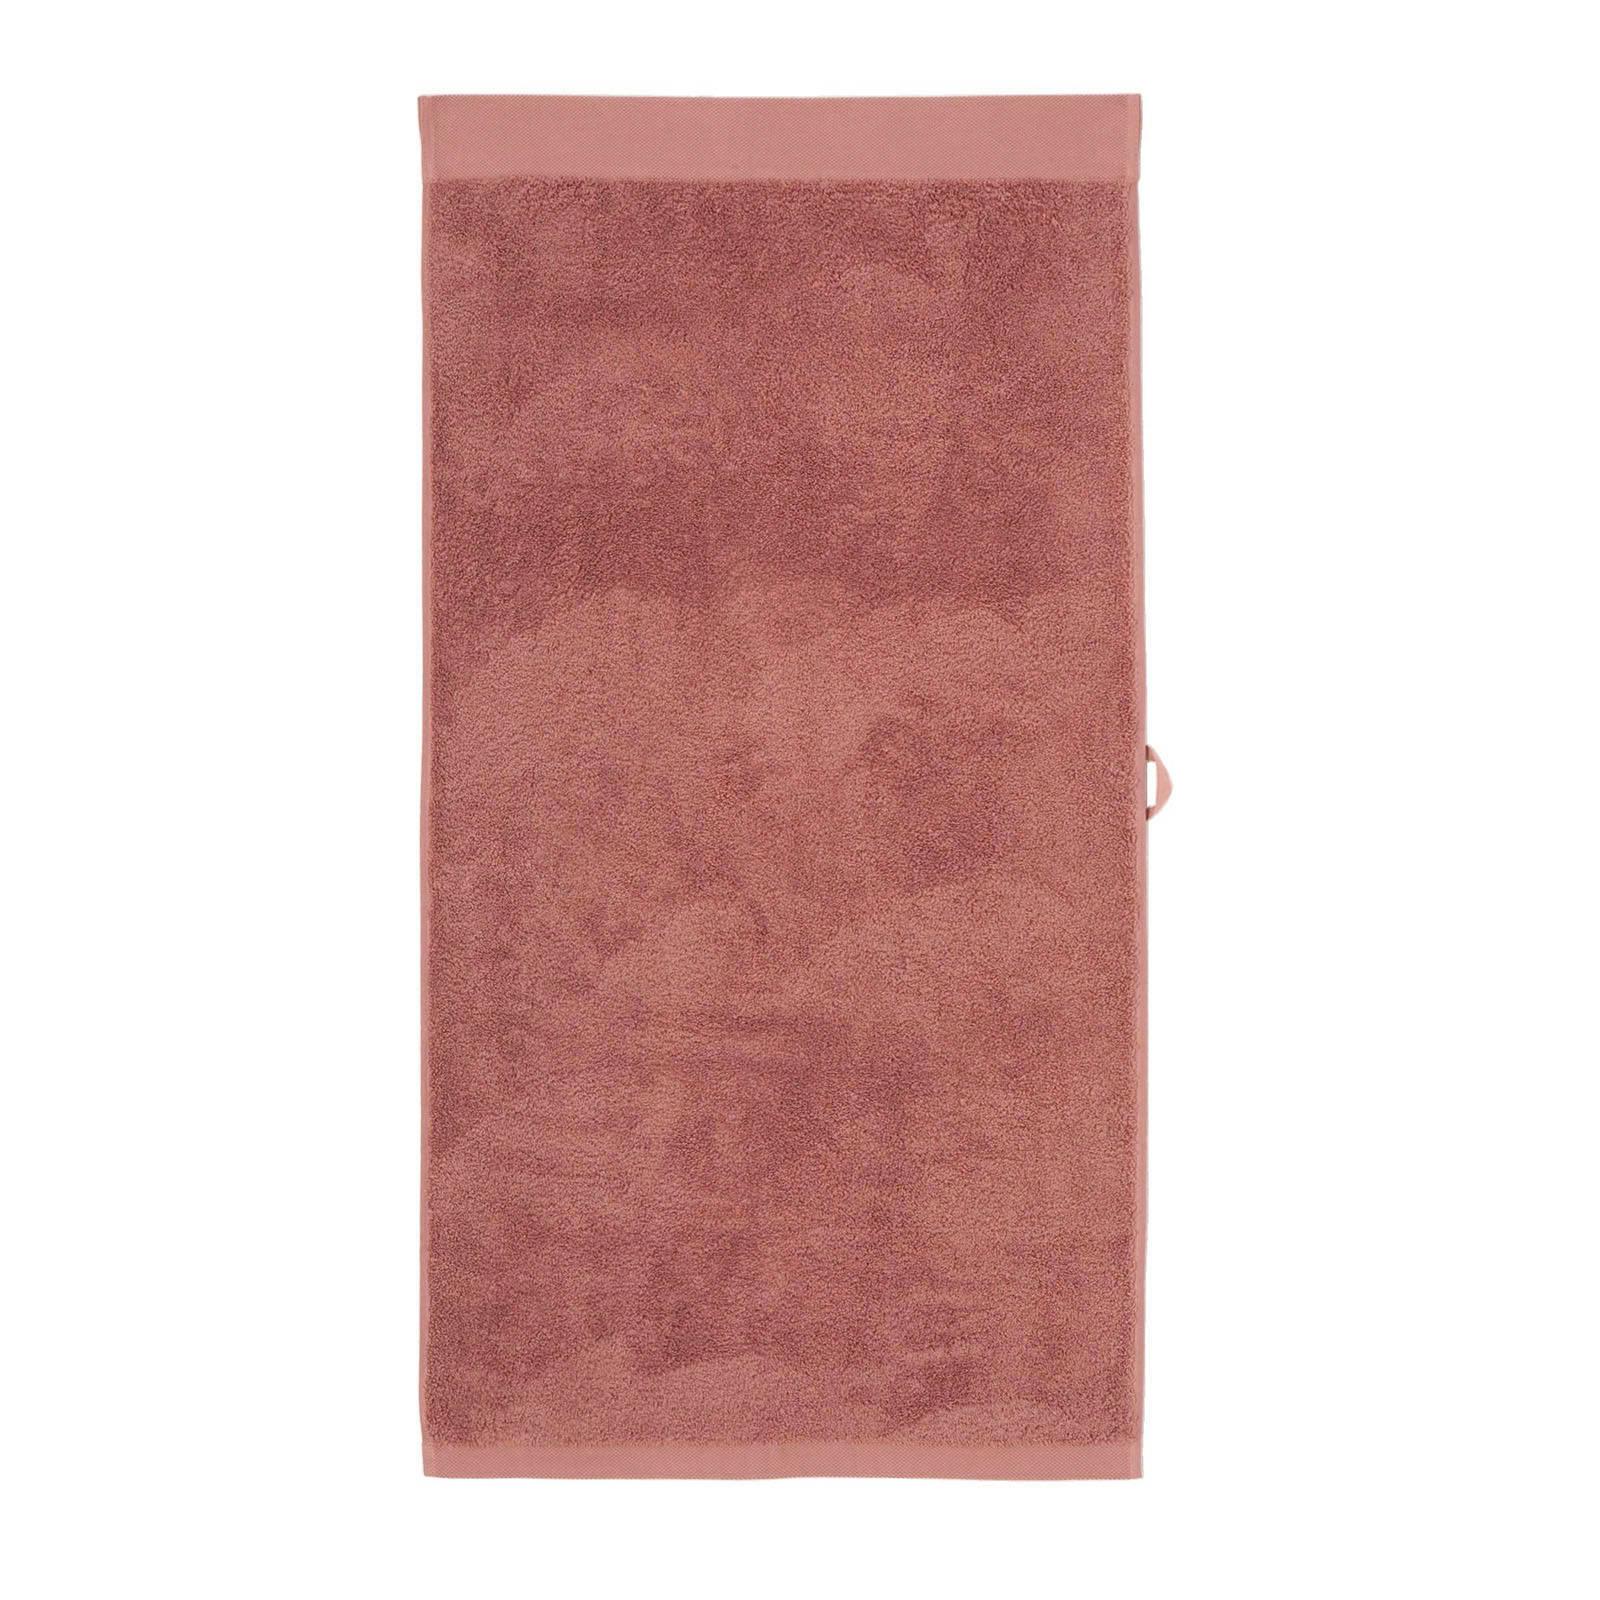 whkmp's own handdoek hotelkwaliteit